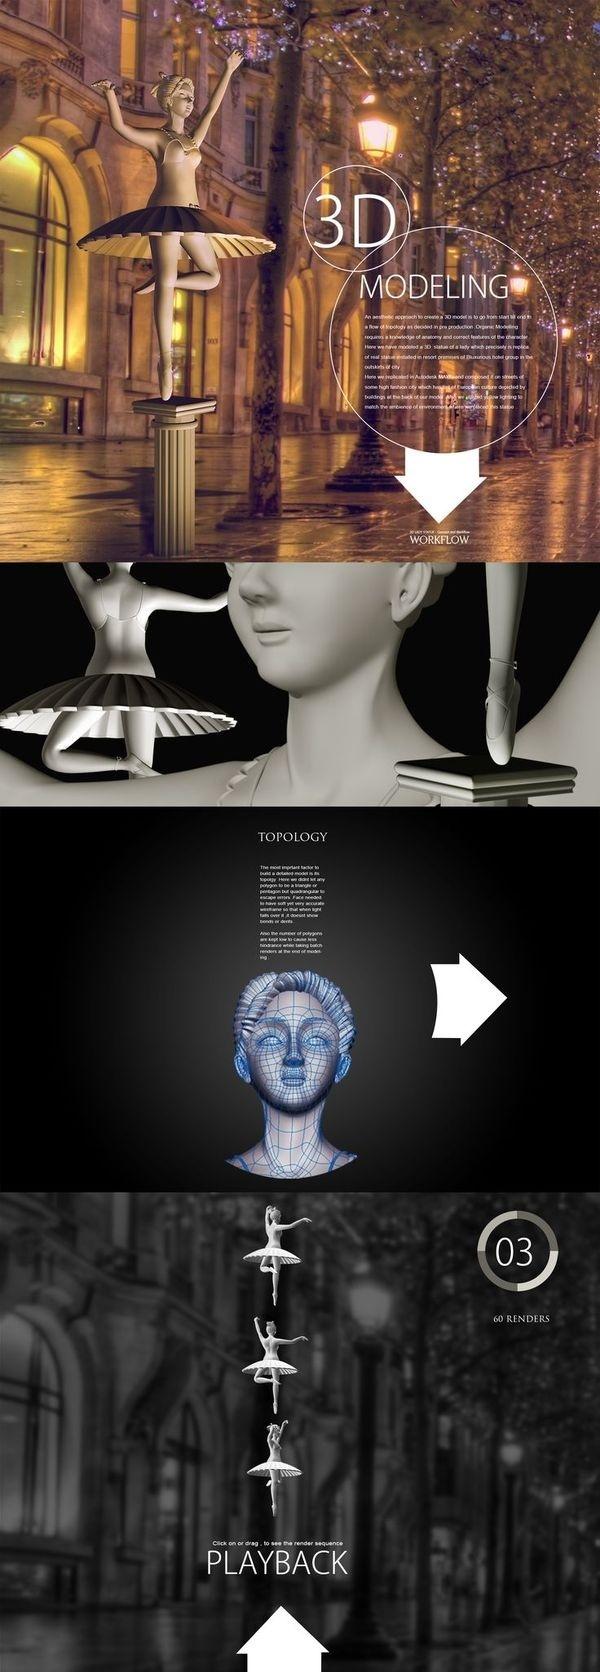 3D Model   lady statue   workflow #statue #workflow #3d